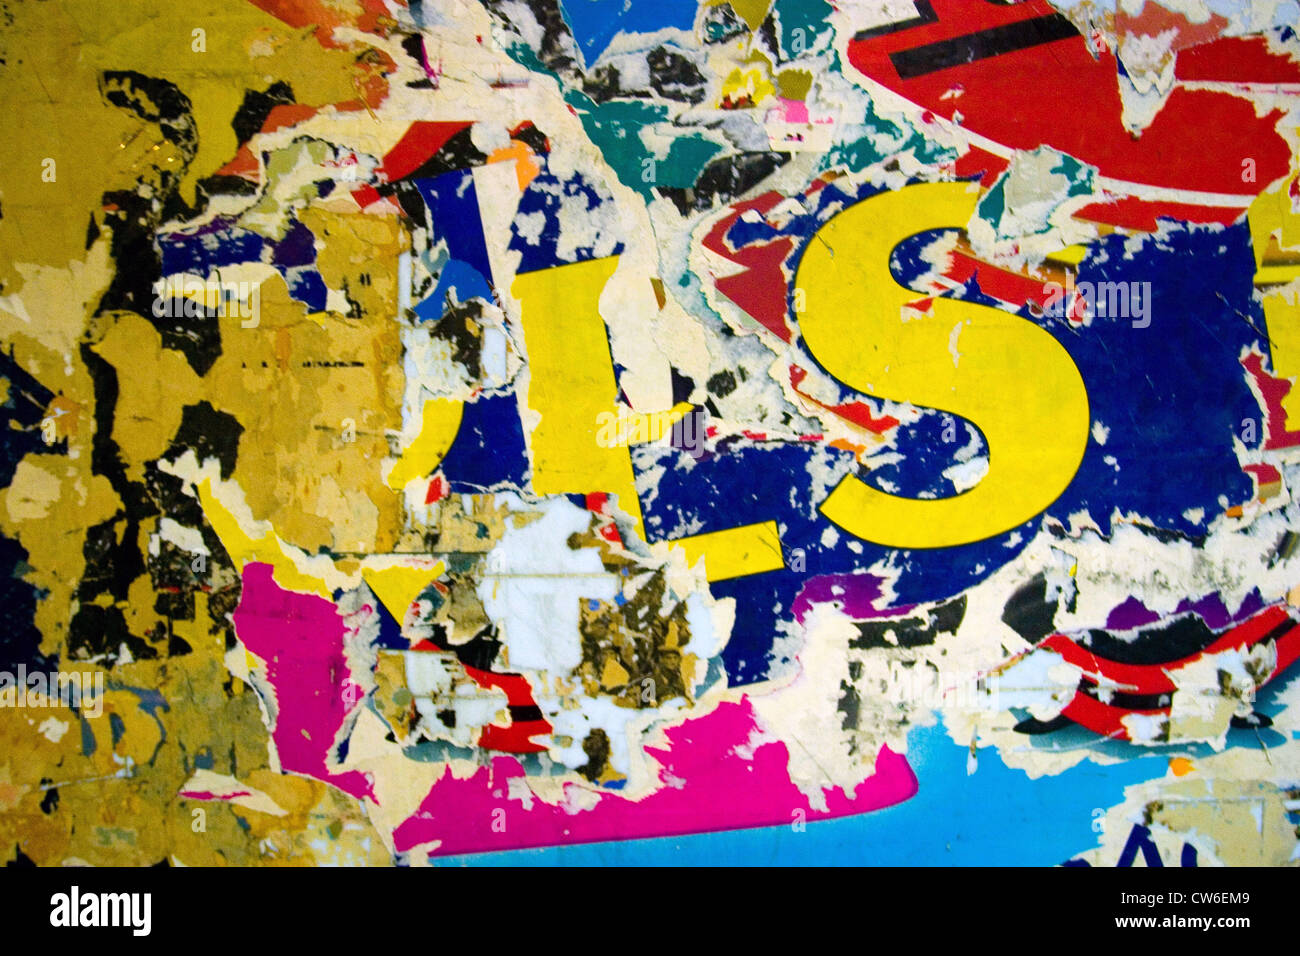 Textures on a Paris subway wall., France, Paris Stock Photo ...